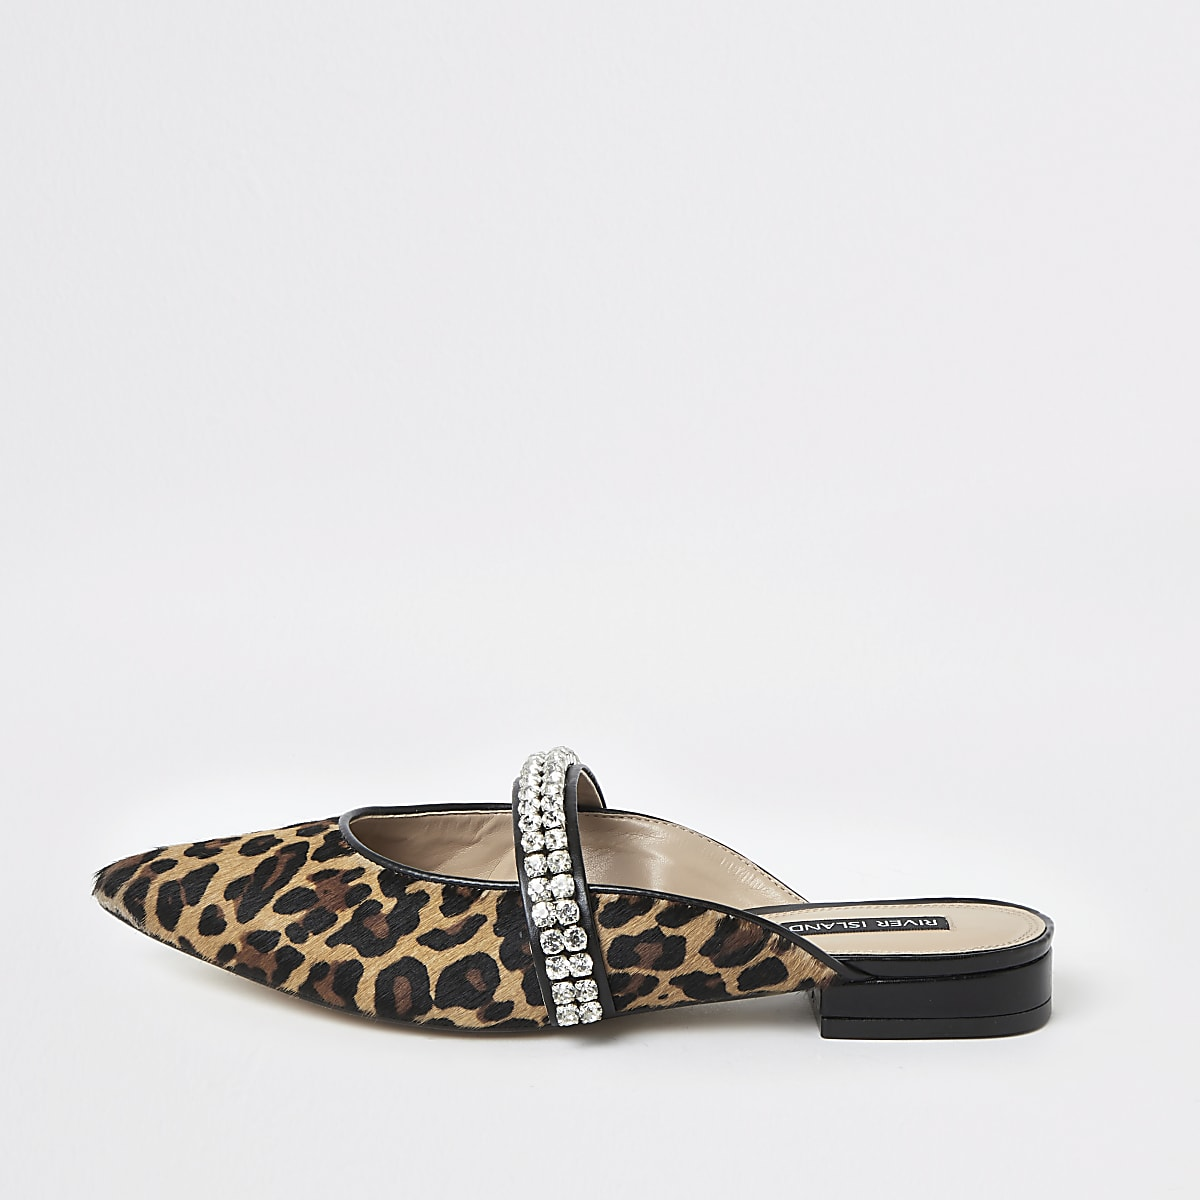 Bruine puntige loafers zonder hiel met luipaardprint en siersteentjes